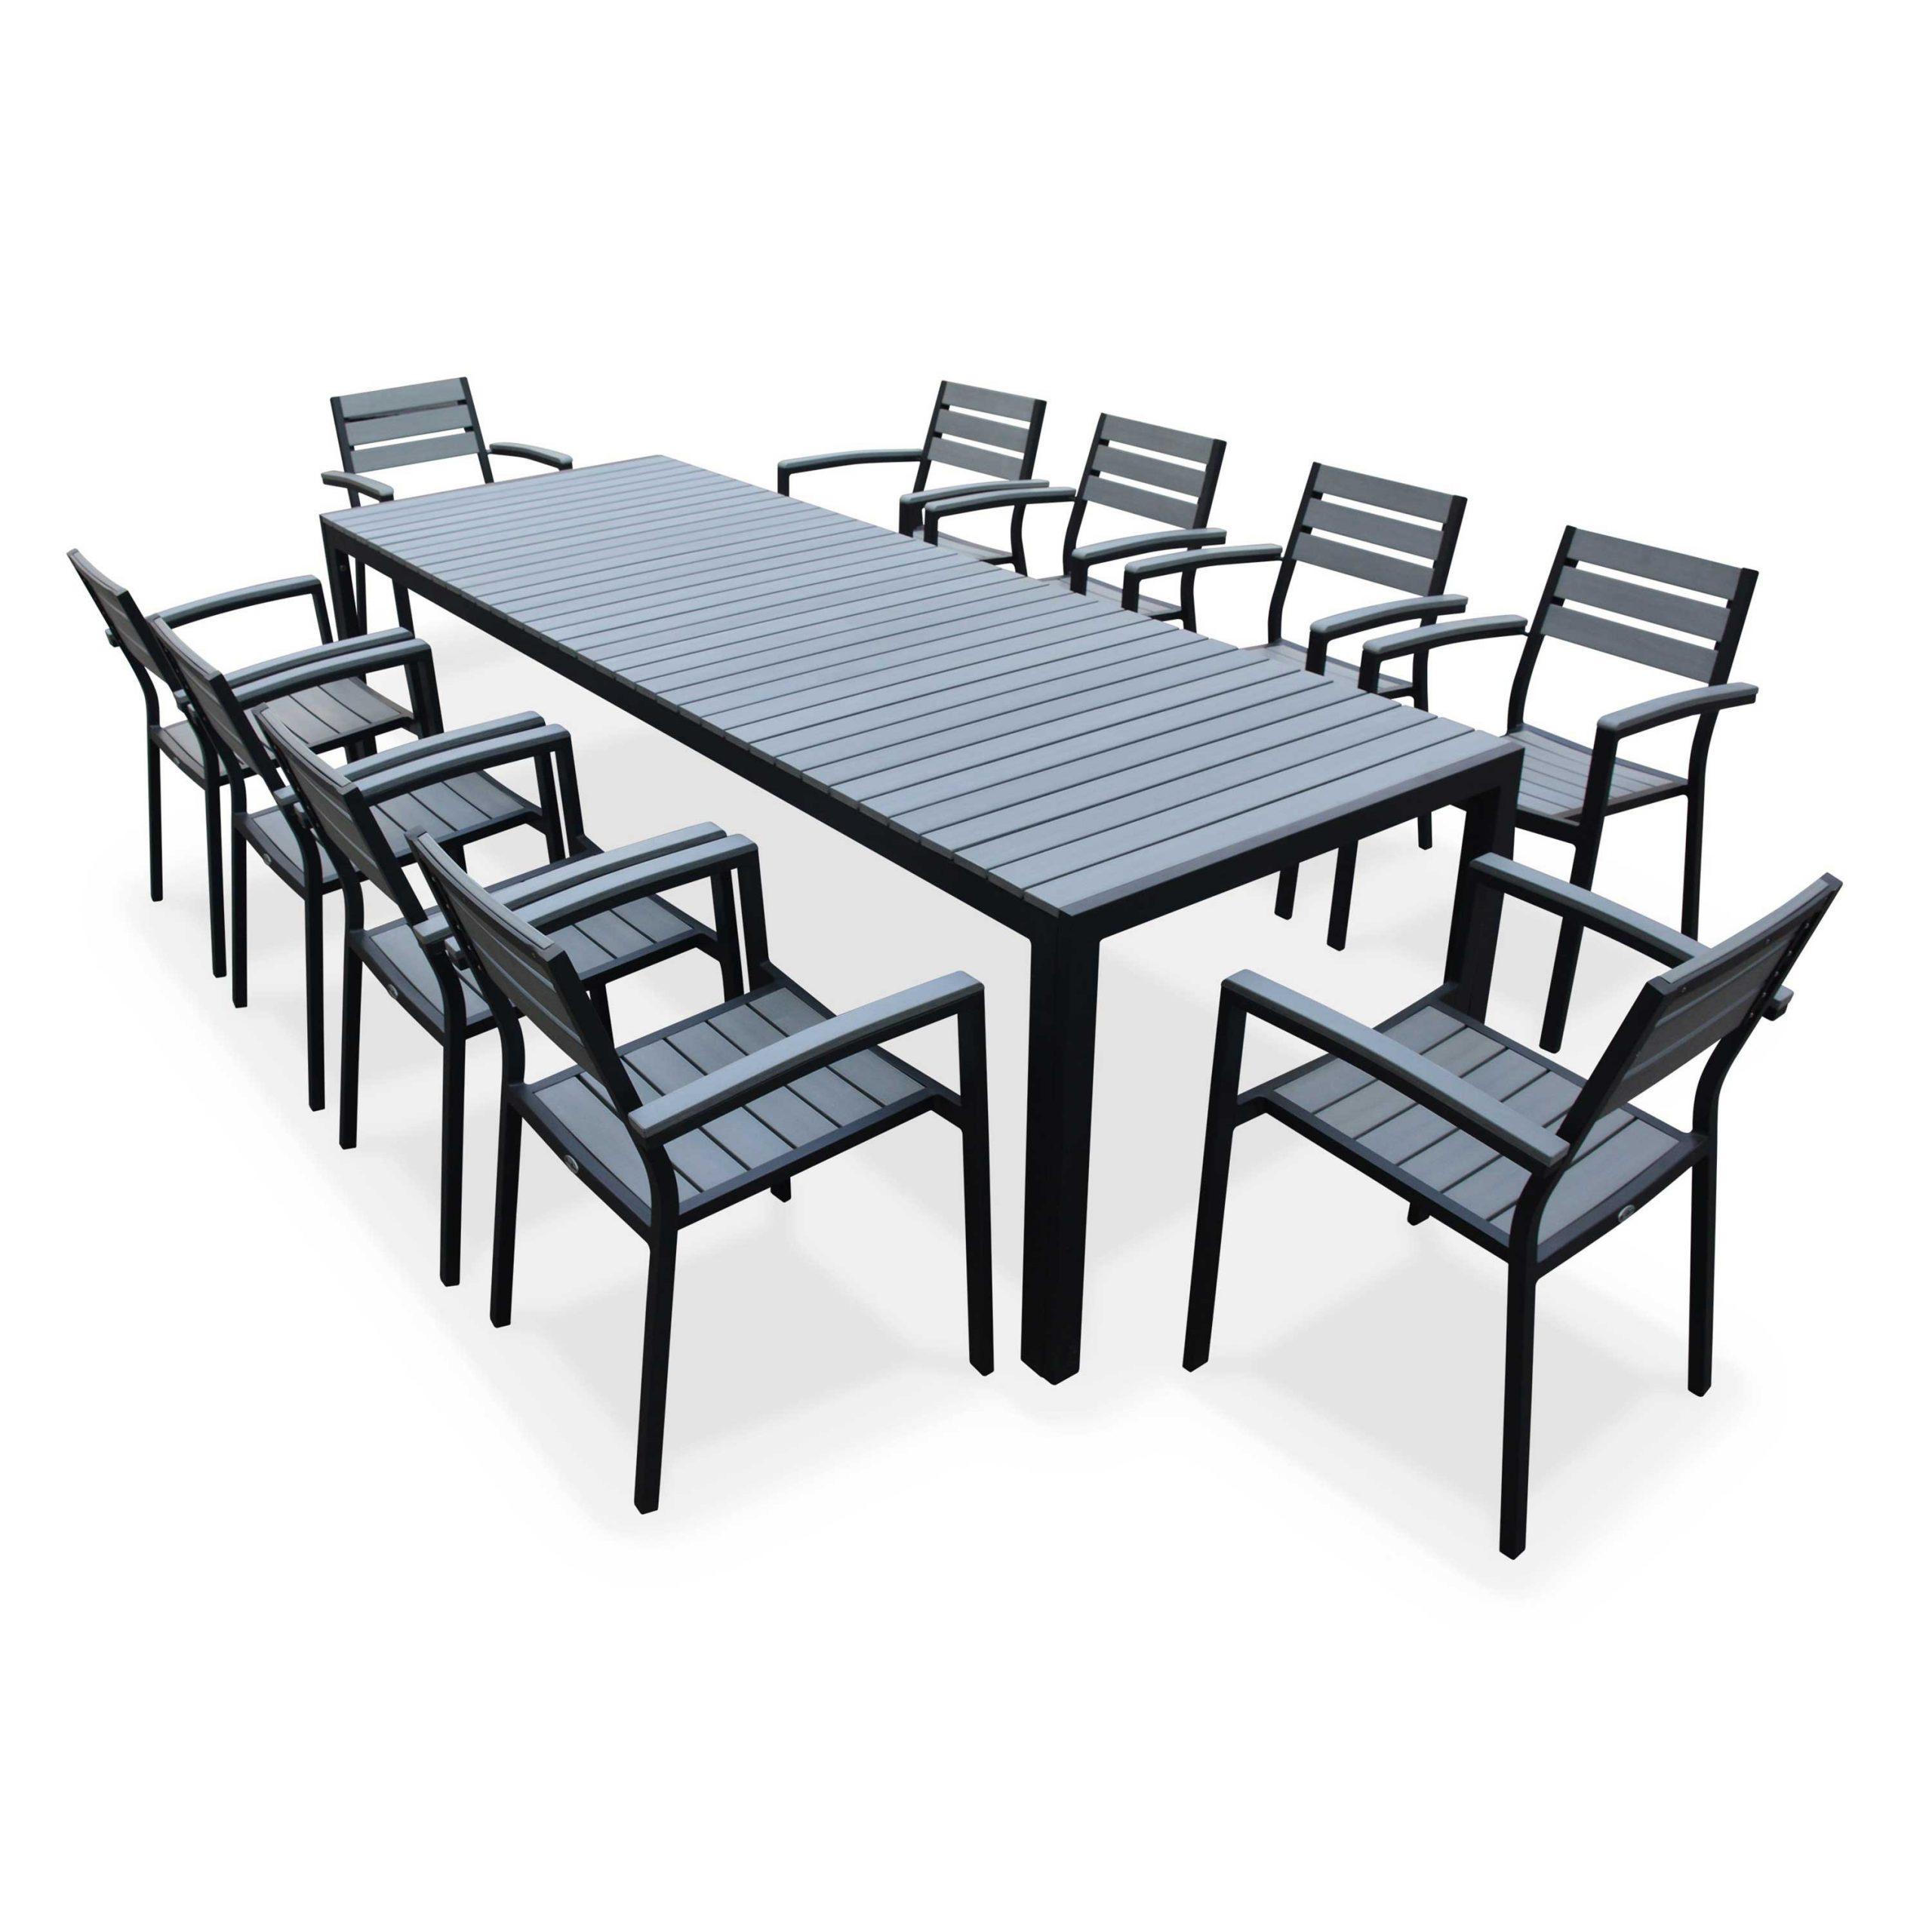 Table De 10 Jardin Personnes Castorama Rocqdxewb pour Table De Jardin 10 Personnes